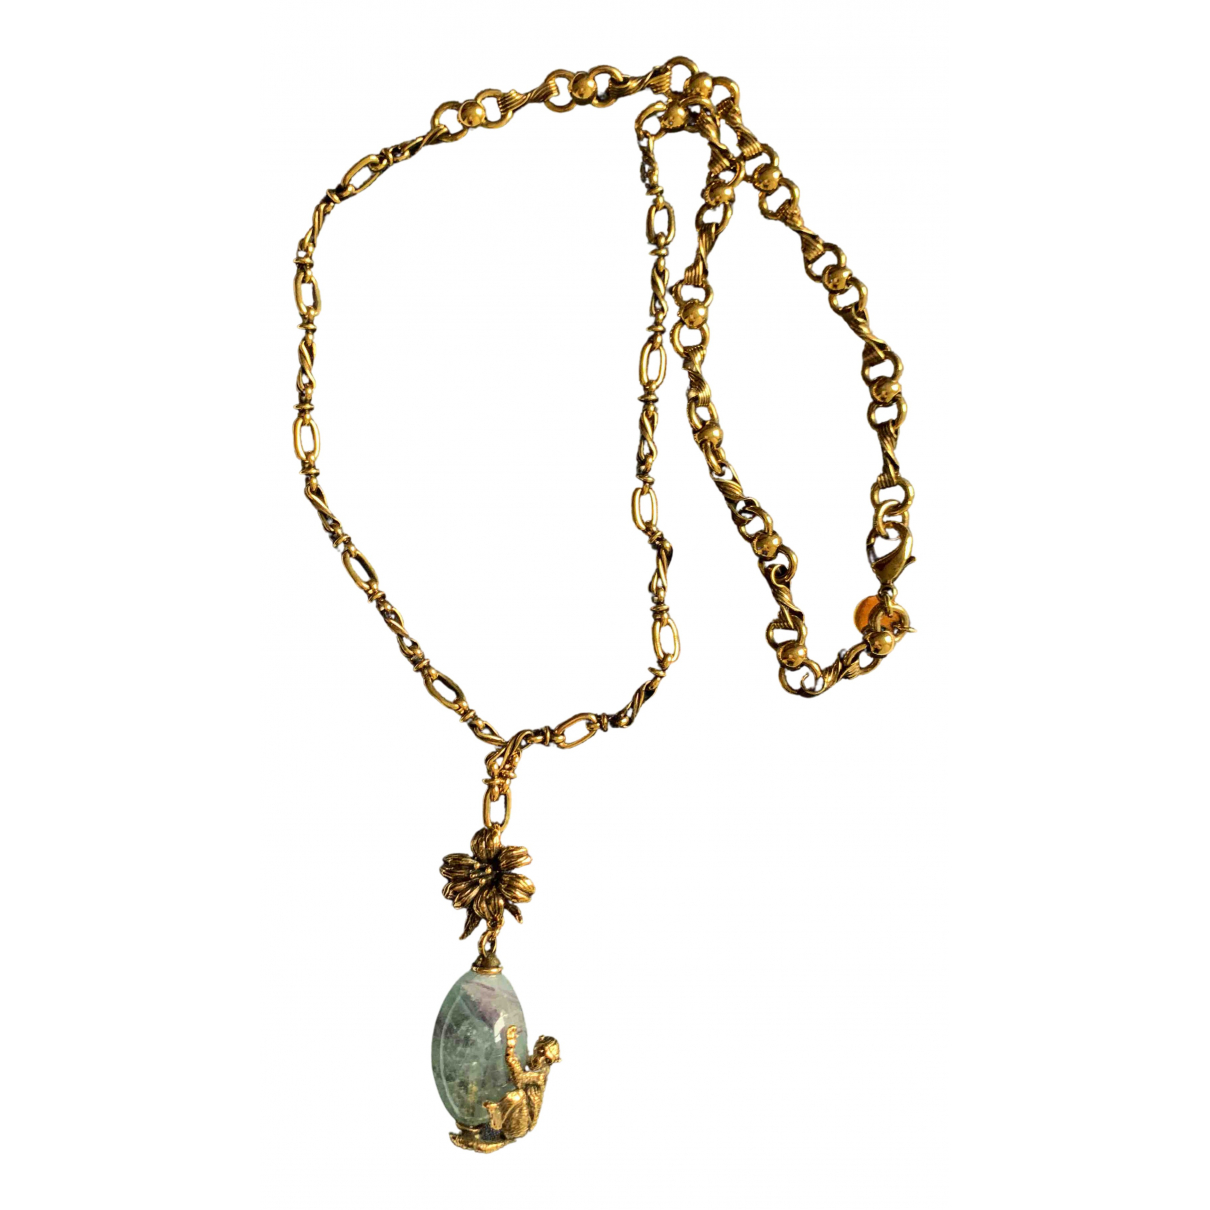 Prada N Gold Metal necklace for Women N